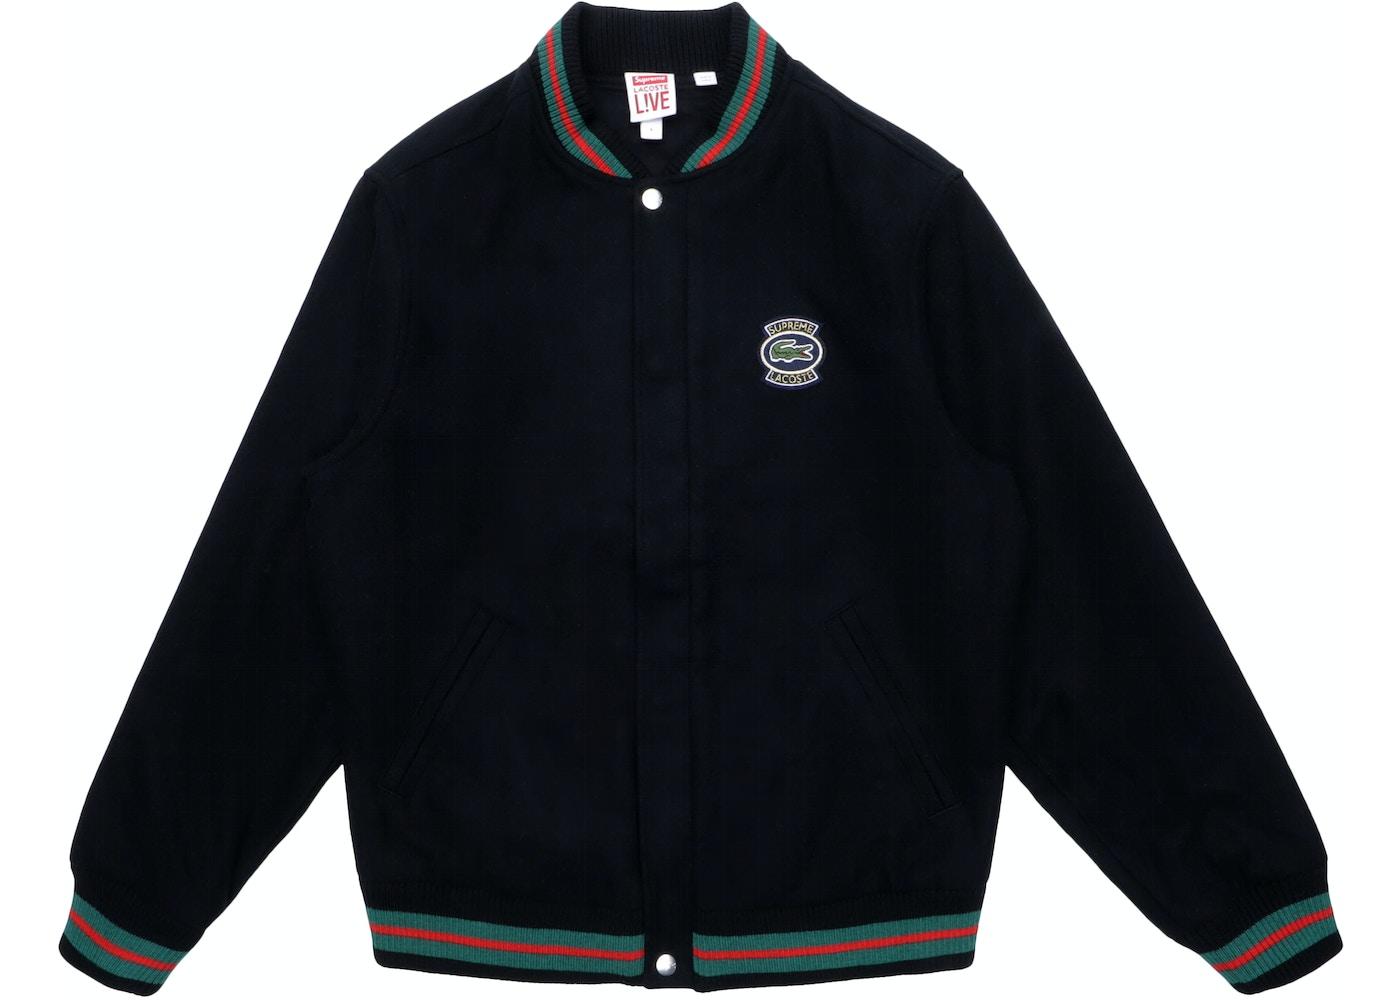 b2cbadb6 Supreme LACOSTE Wool Varsity Jacket Black - SS18